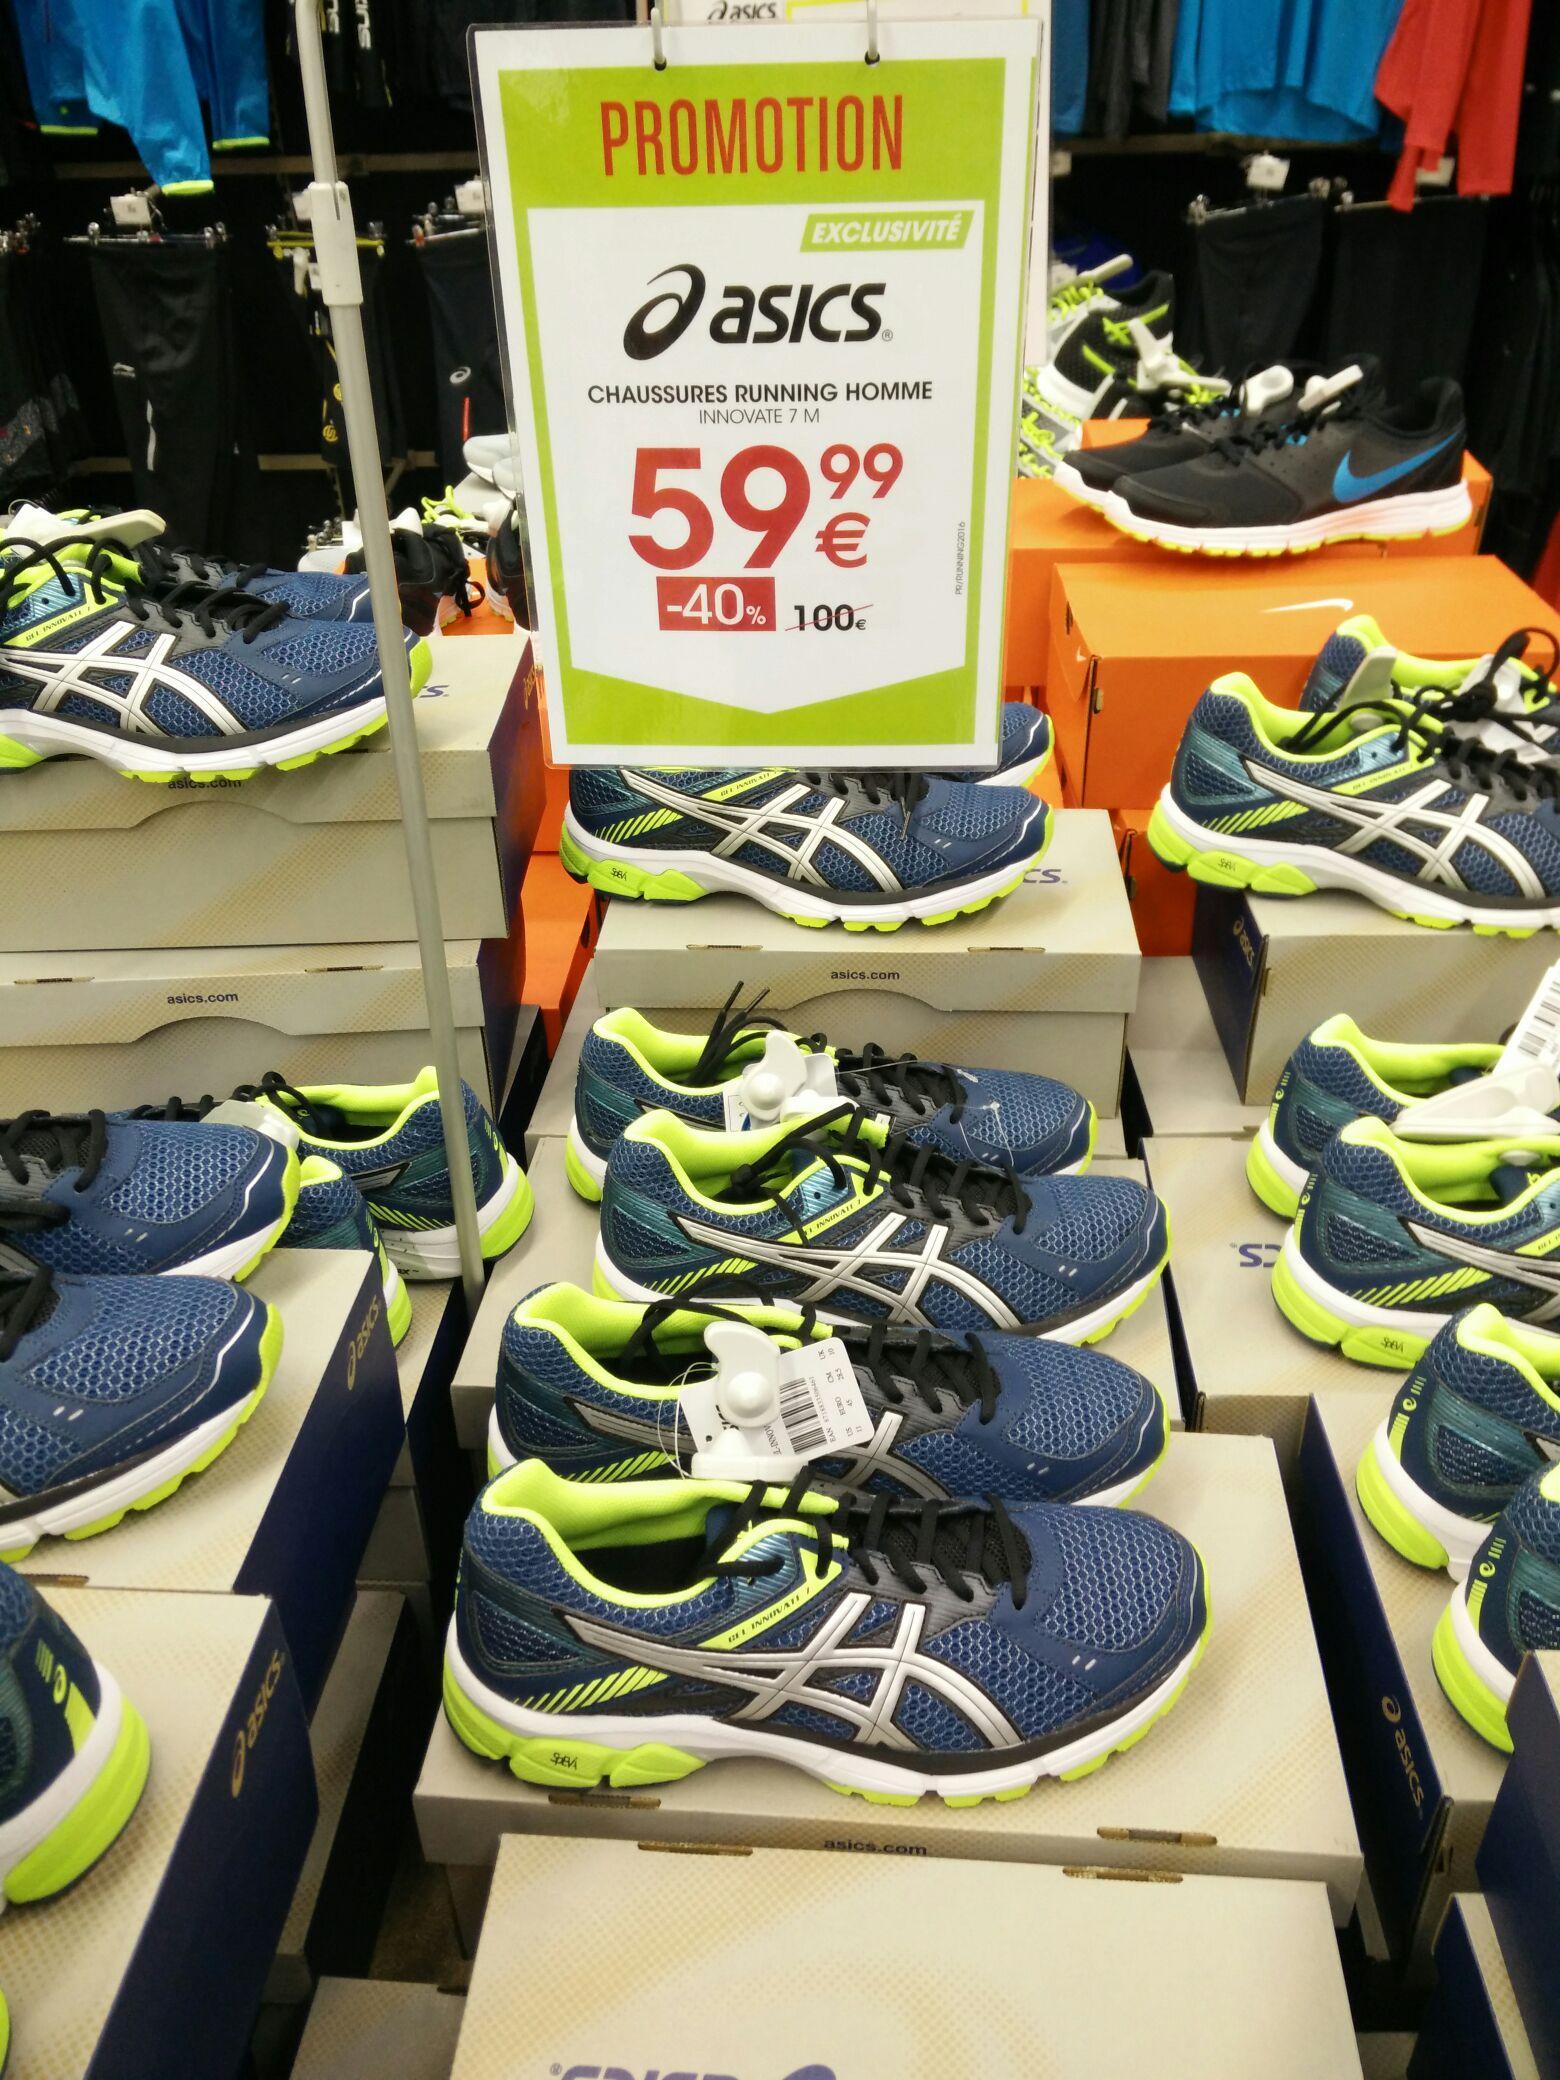 Chaussures de Running Homme Asics Innovate 7M